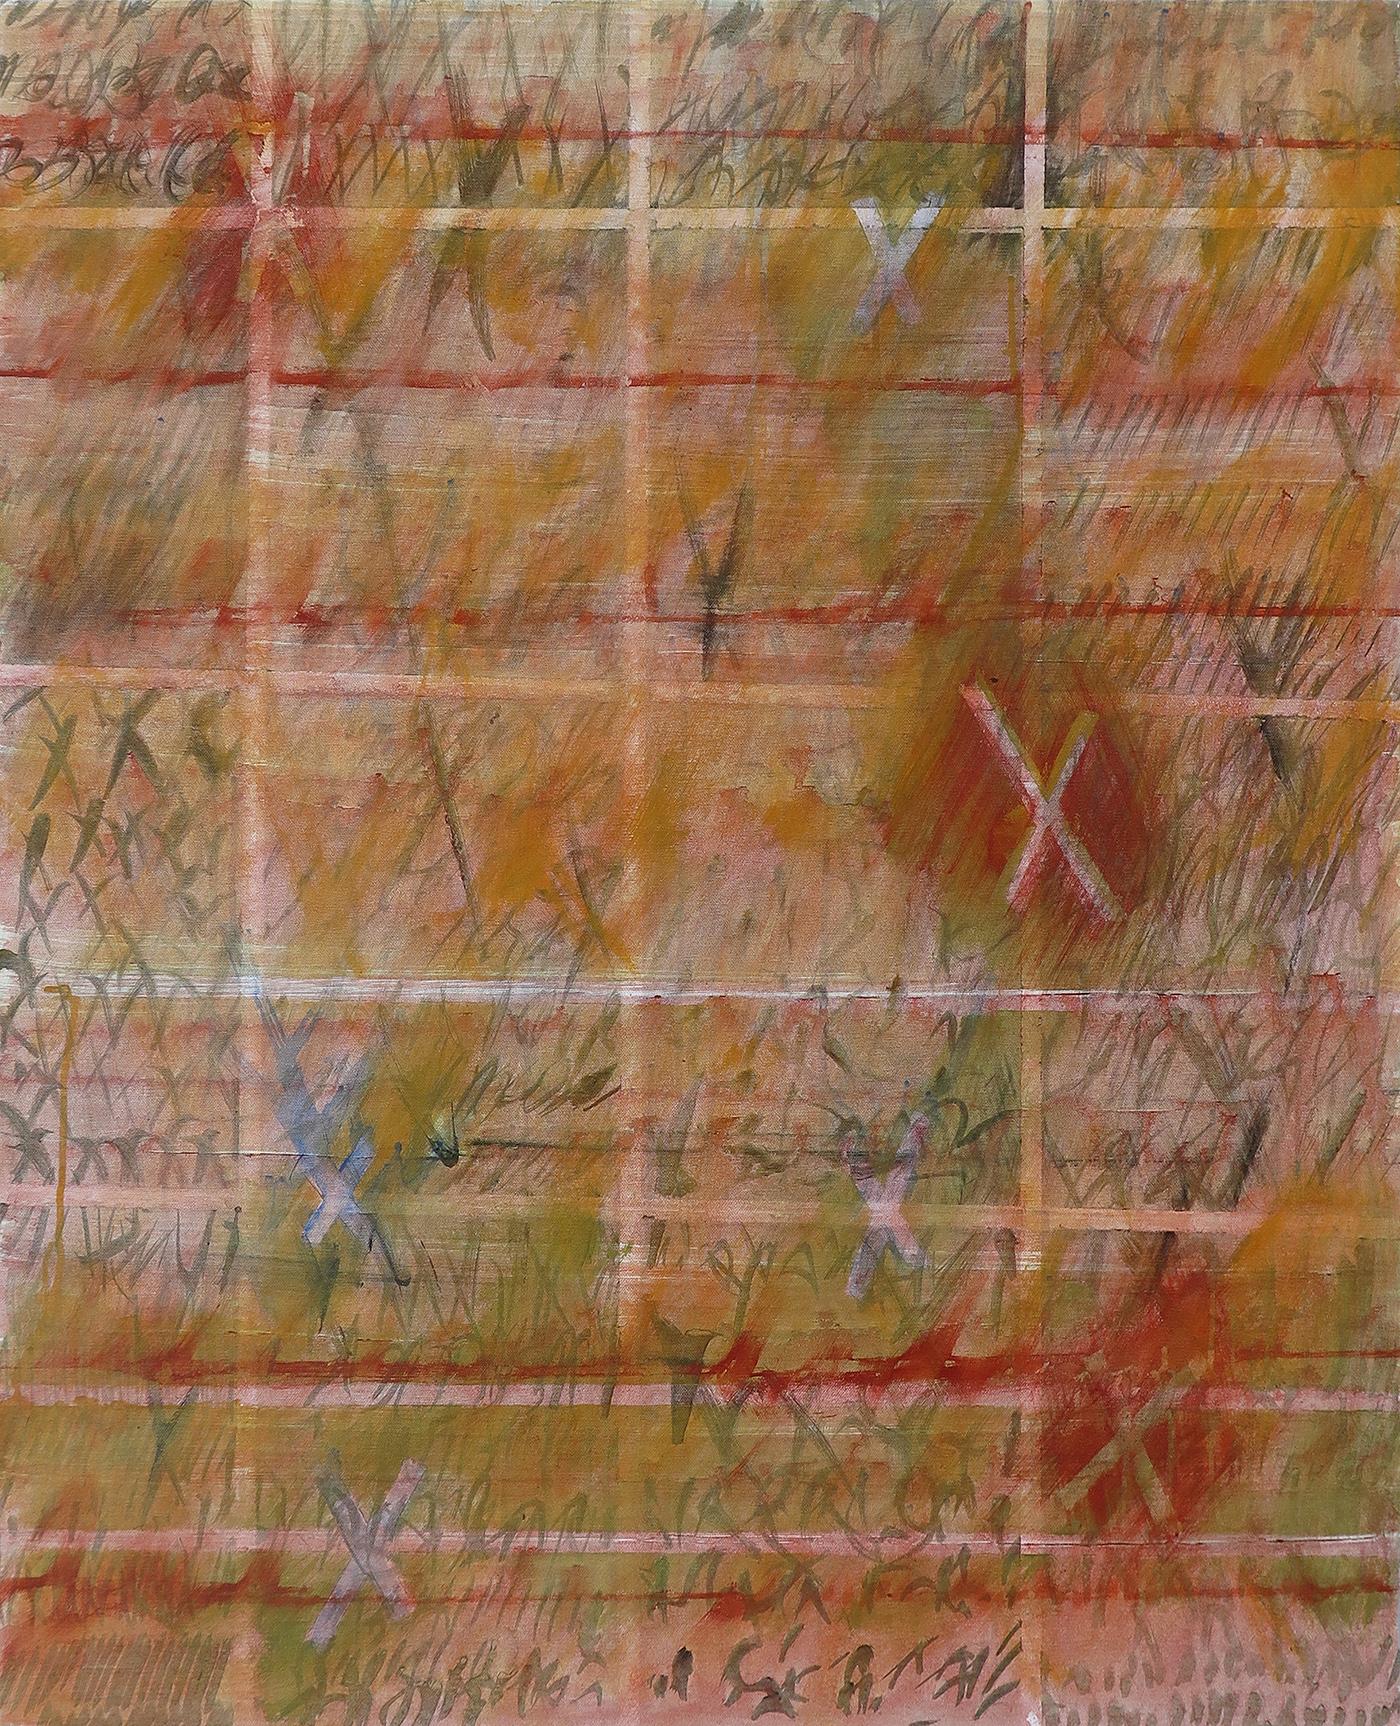 Acrílico sobre tela, 100 x 81 cm, # 5